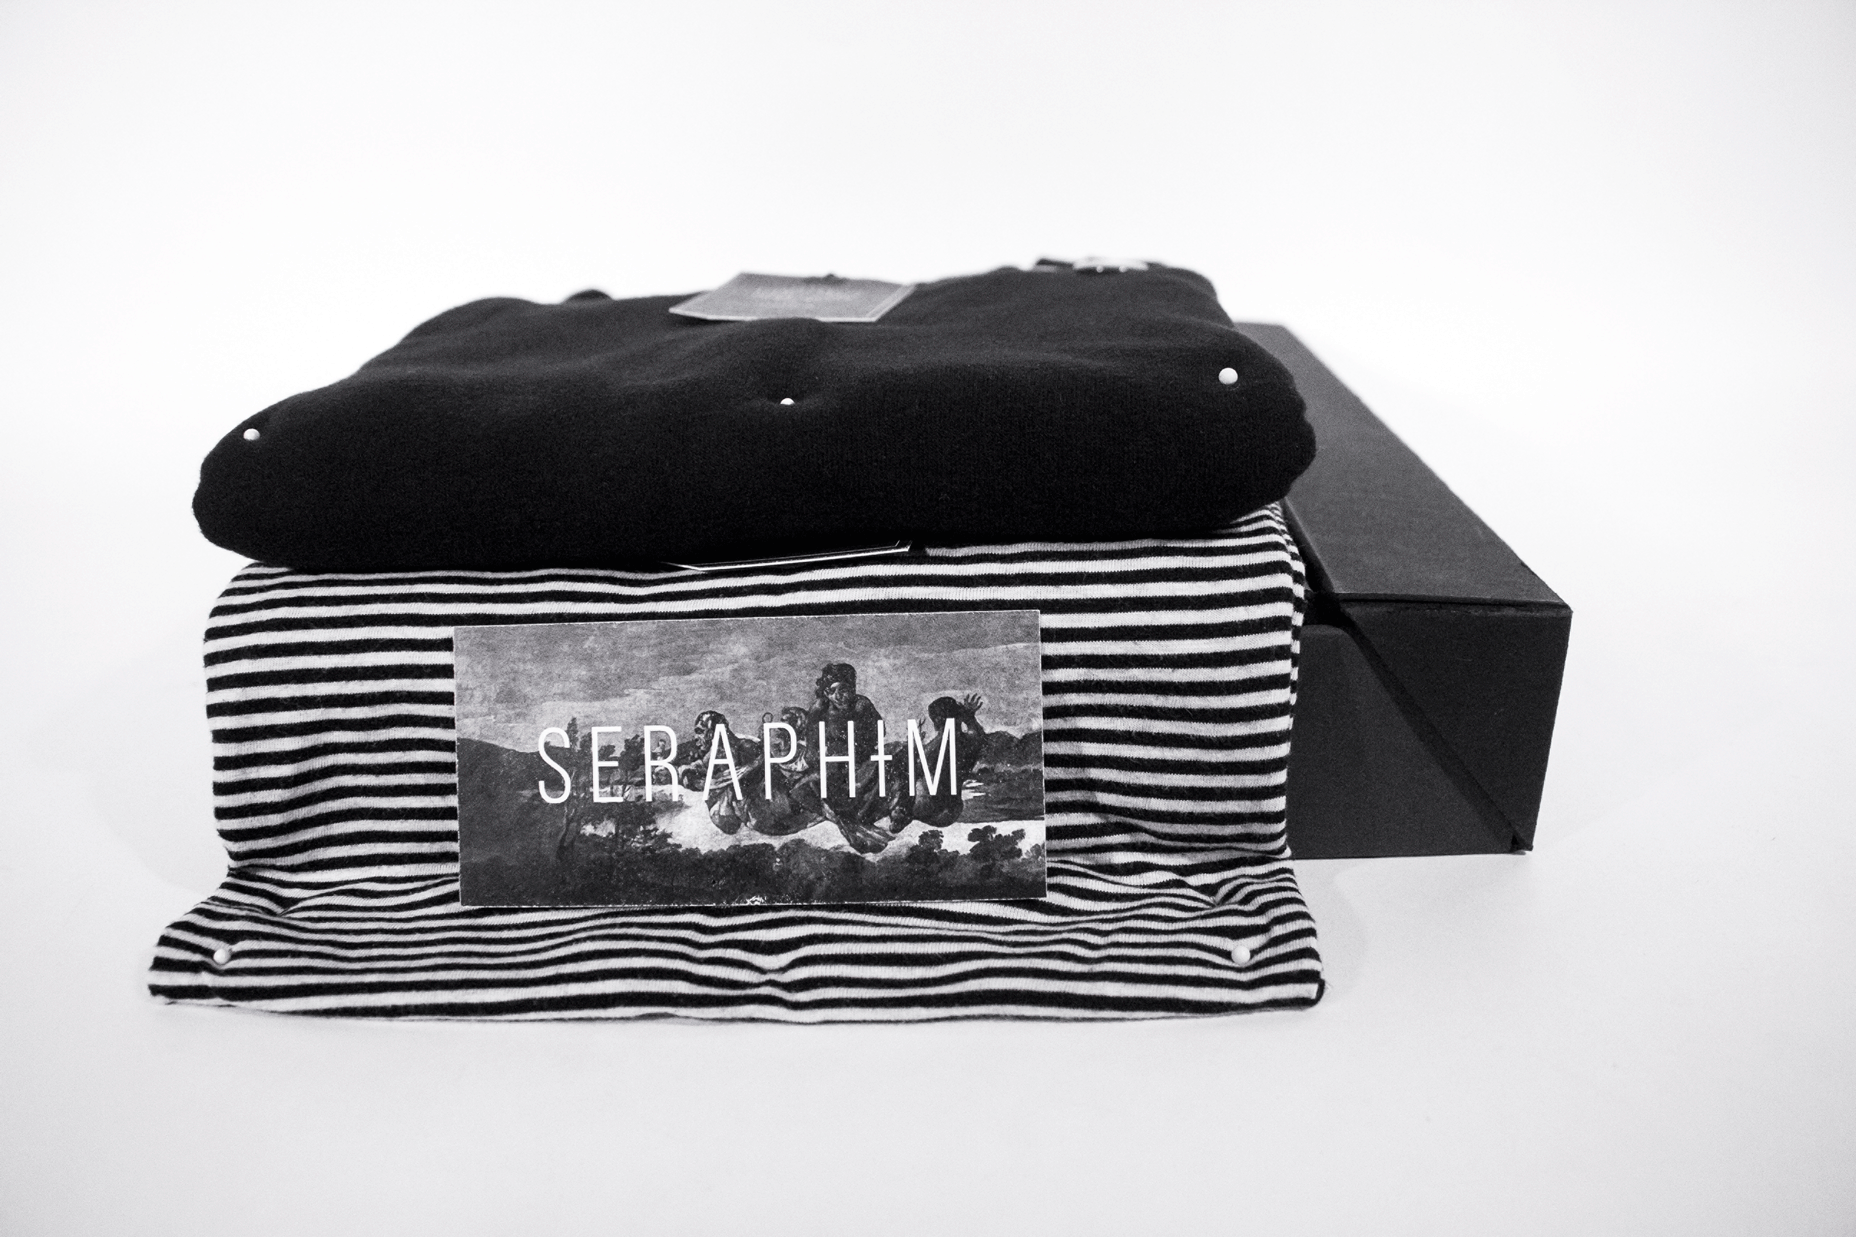 Seraphim_14.png